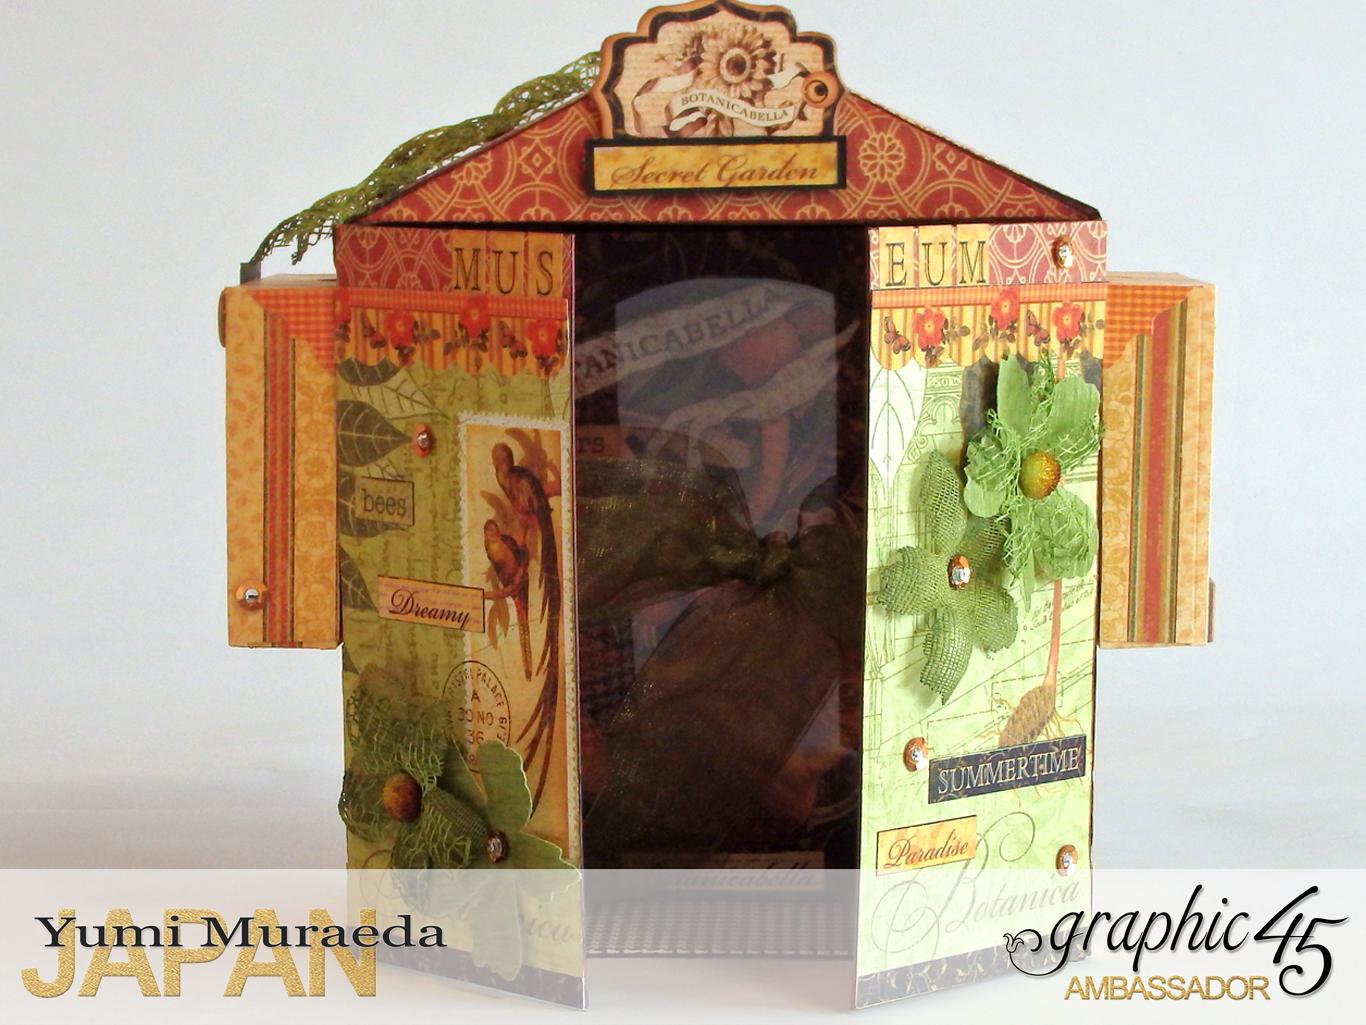 1Secret Gaden Museum, Botanicabella, by Yumi Muraeda, Product by Graphic 45jpg